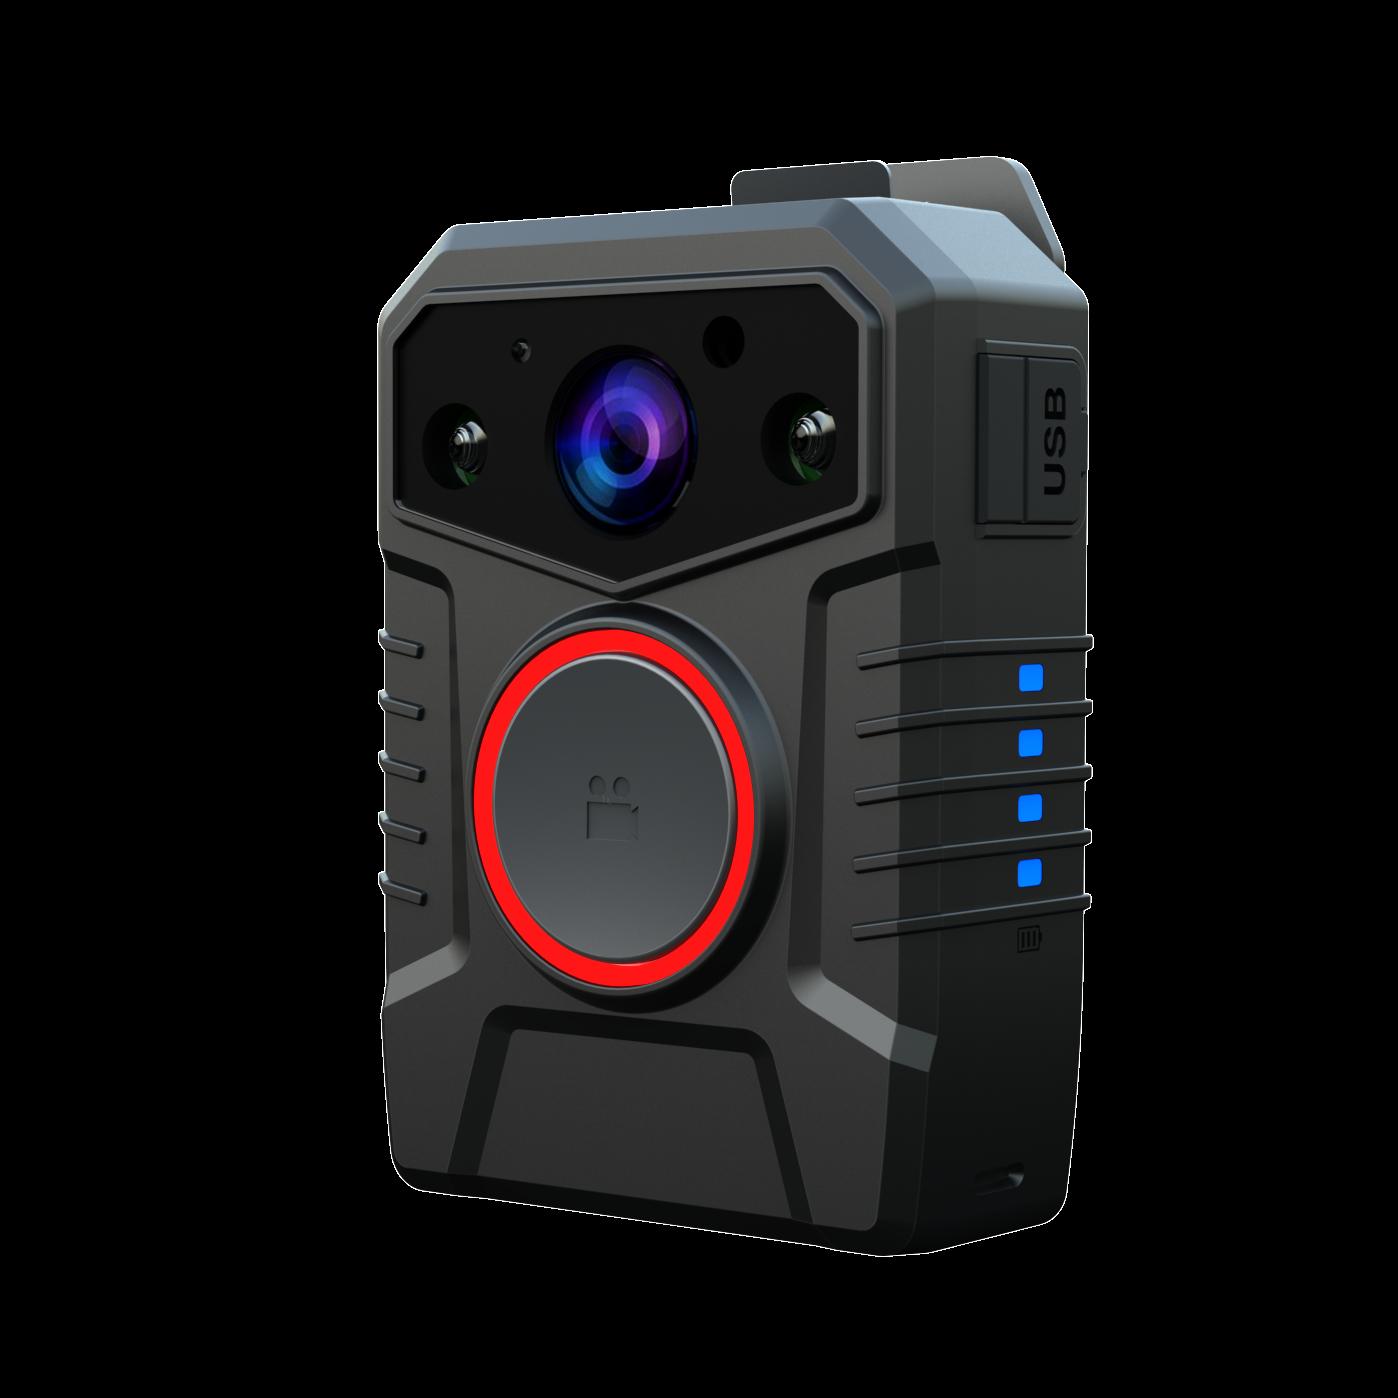 2018 New Body Camera Massage Hidden Camera Lowepro Bags Long Range Ptz Buy Massage Hidden Cameralowepro Camera Bagslong Range Ptz Camera Product On